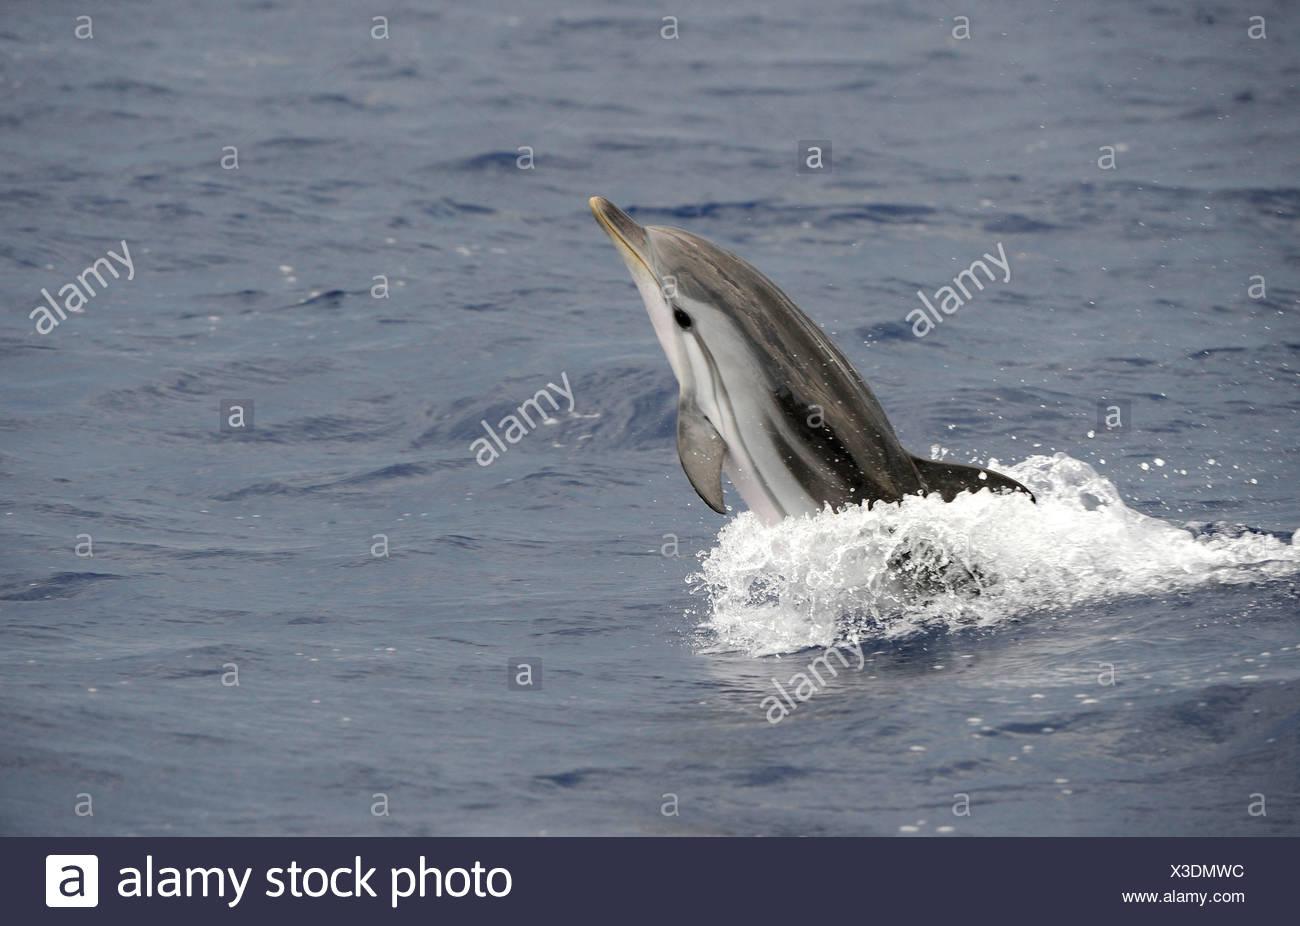 striped dolphin, blue-white dolphin, Euphrosyne dolphin (Stenella coeruleoalba), jumping, Mediterranean - Stock Image